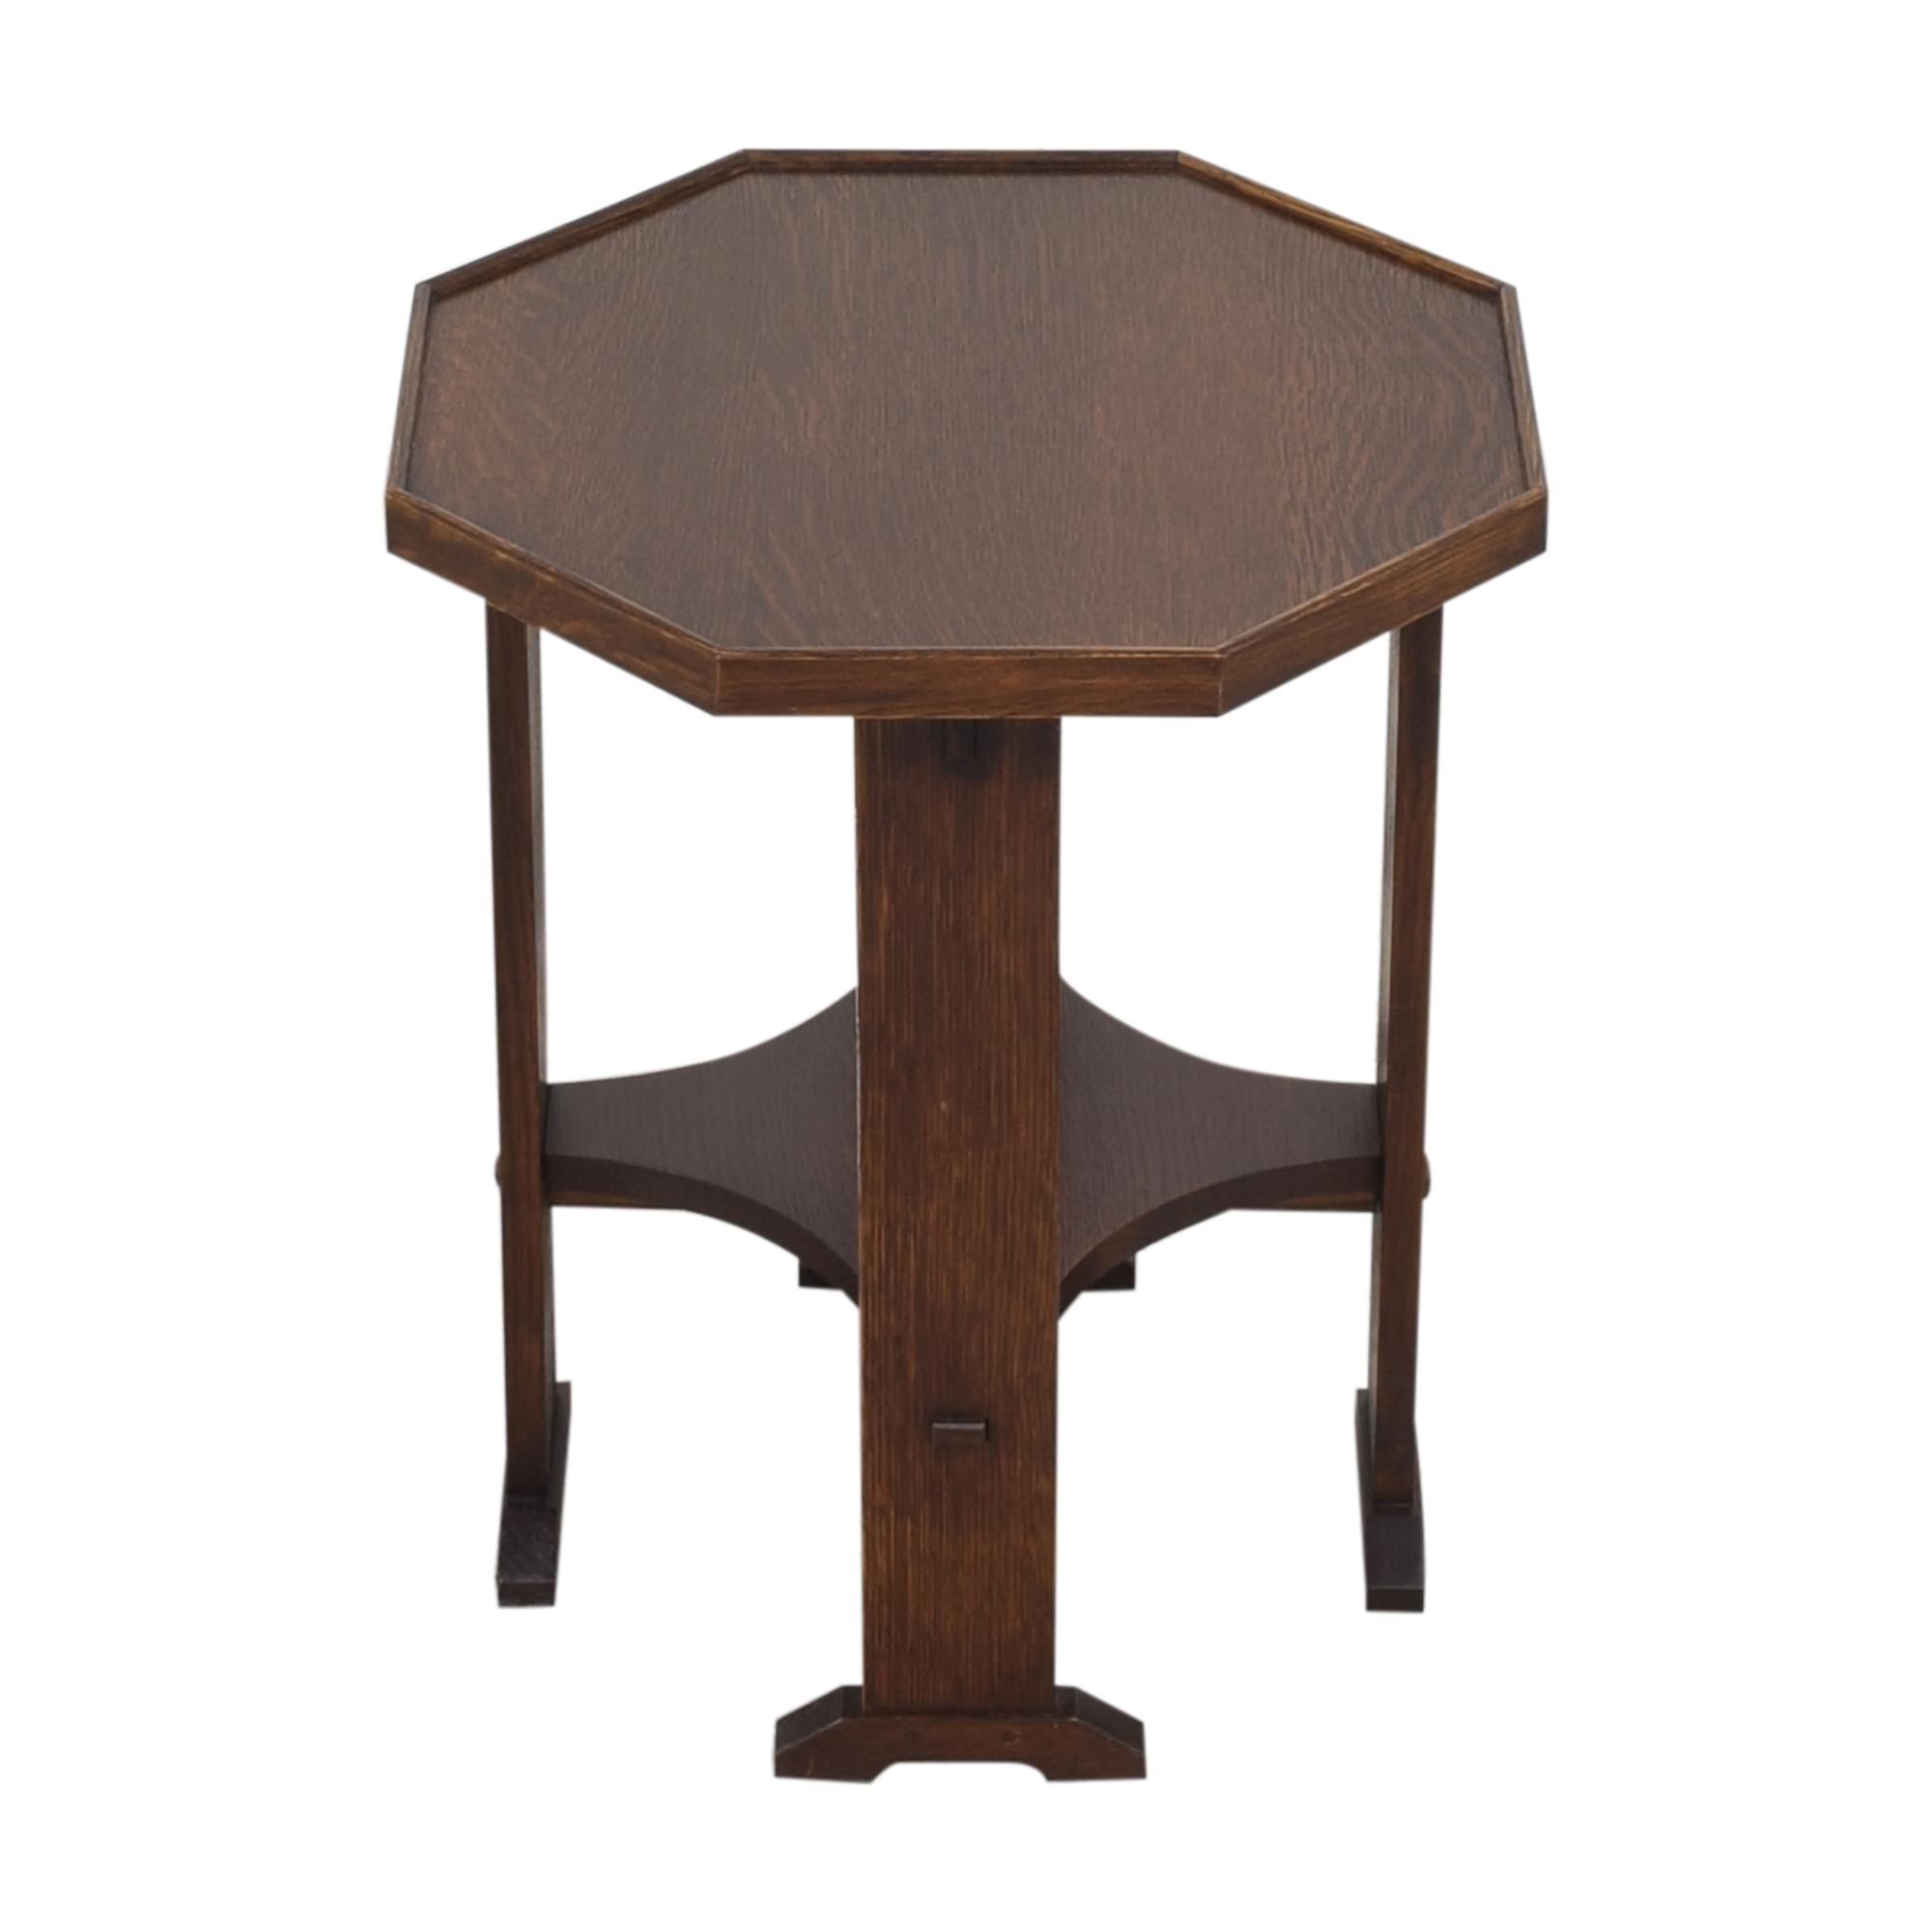 Stickley Furniture Stickley Furniture Hexagonal Side Table nj